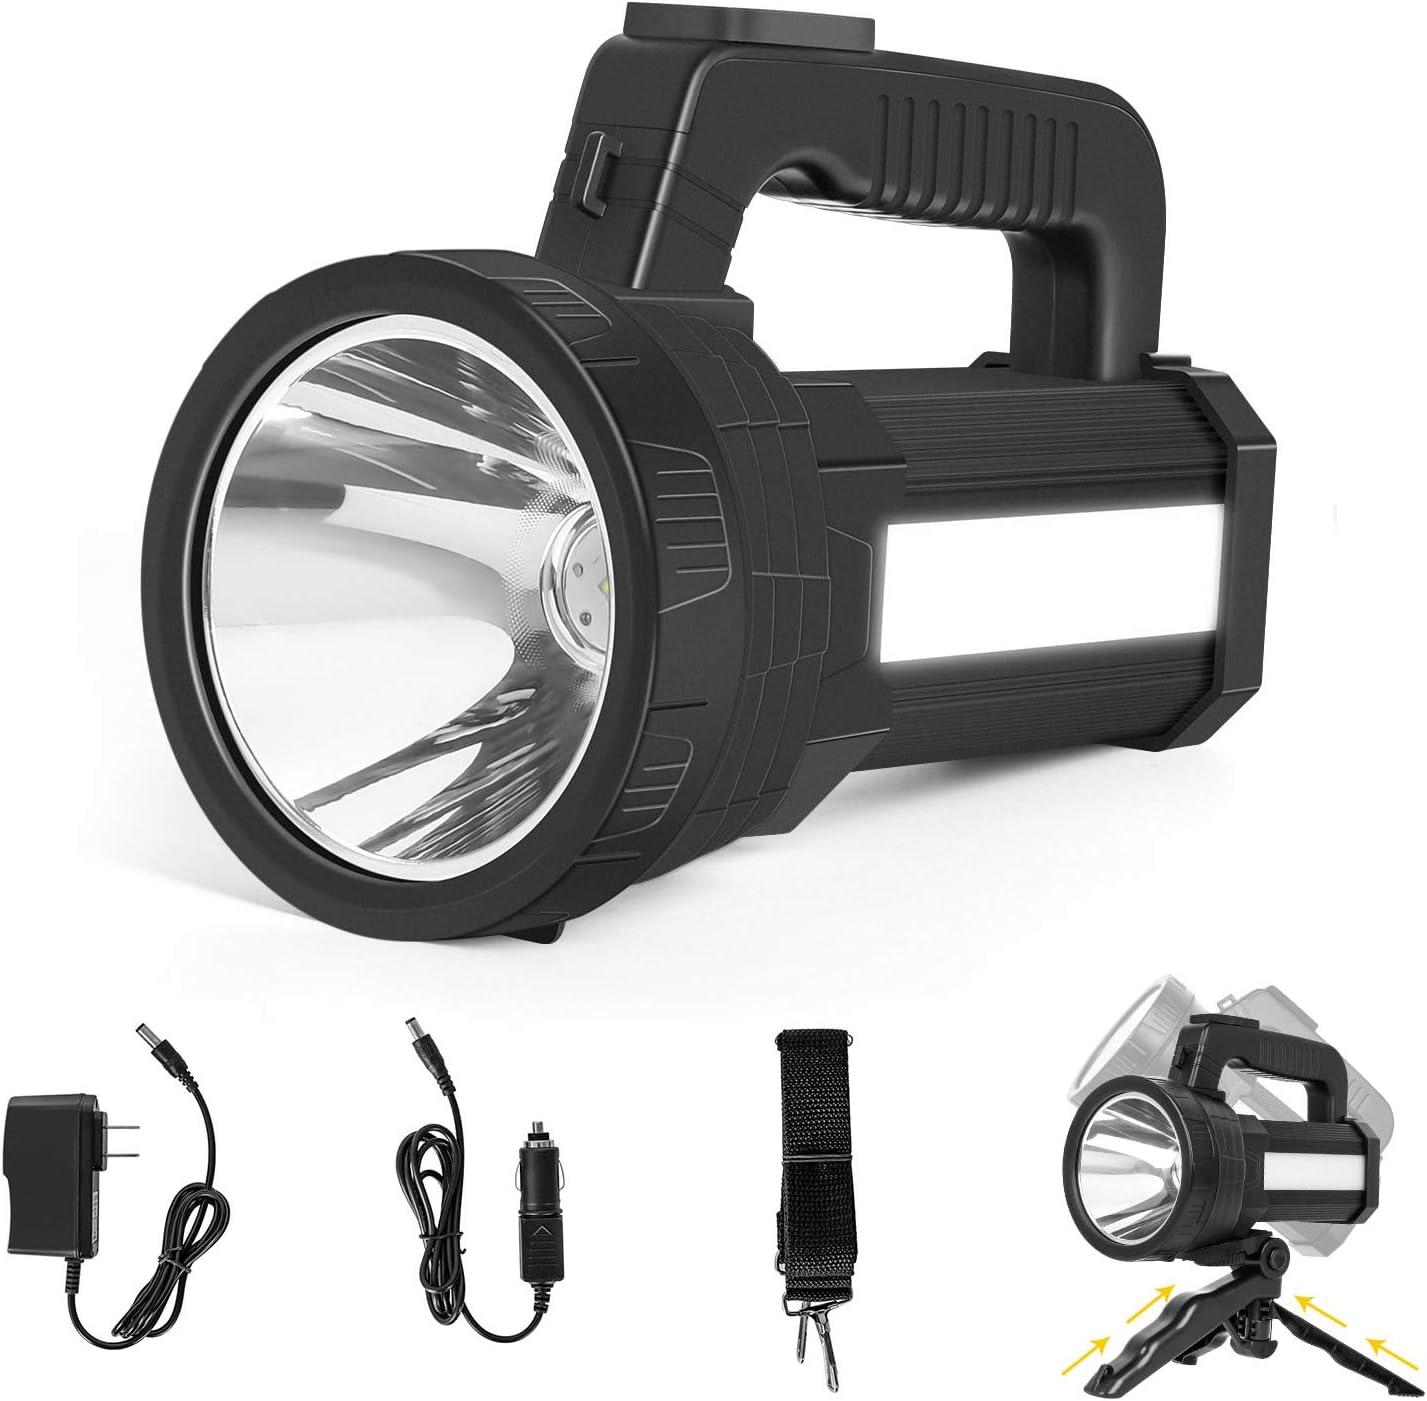 COB Searchlight Spotlight Flashlight USB Rechargeable Hand Torch Work Light Lamp